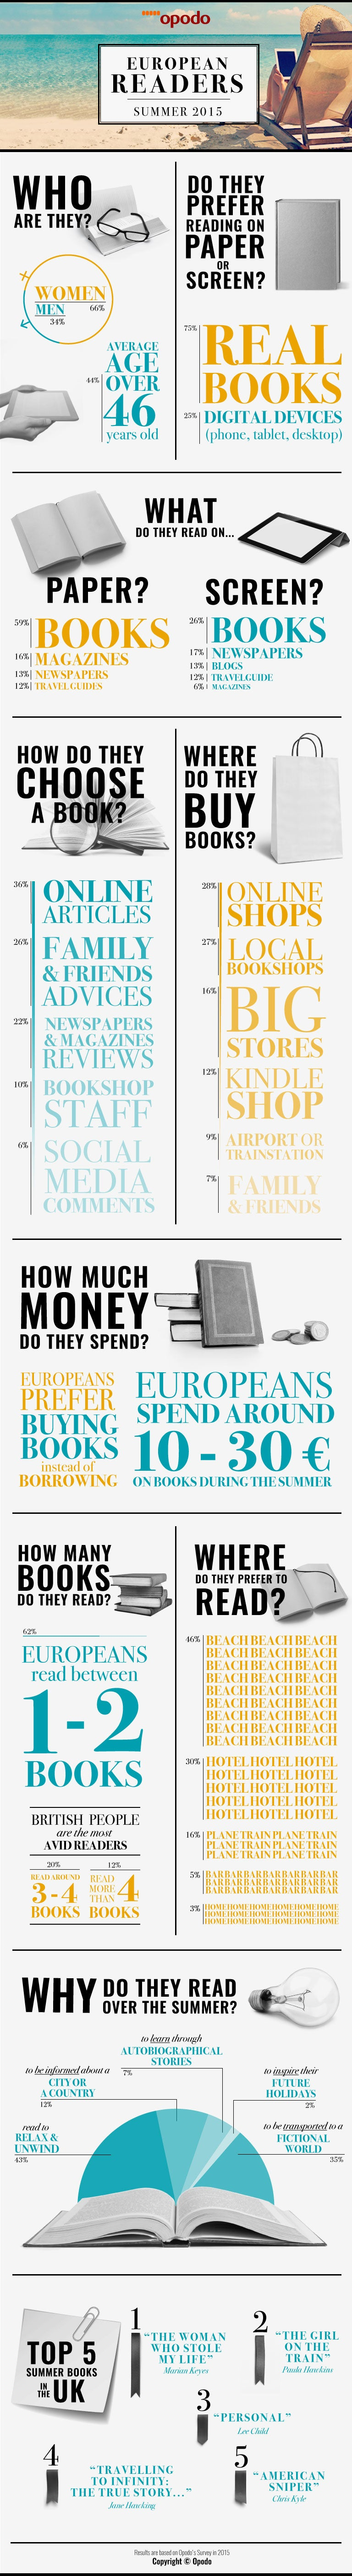 european-reader-profile-infographic_EN